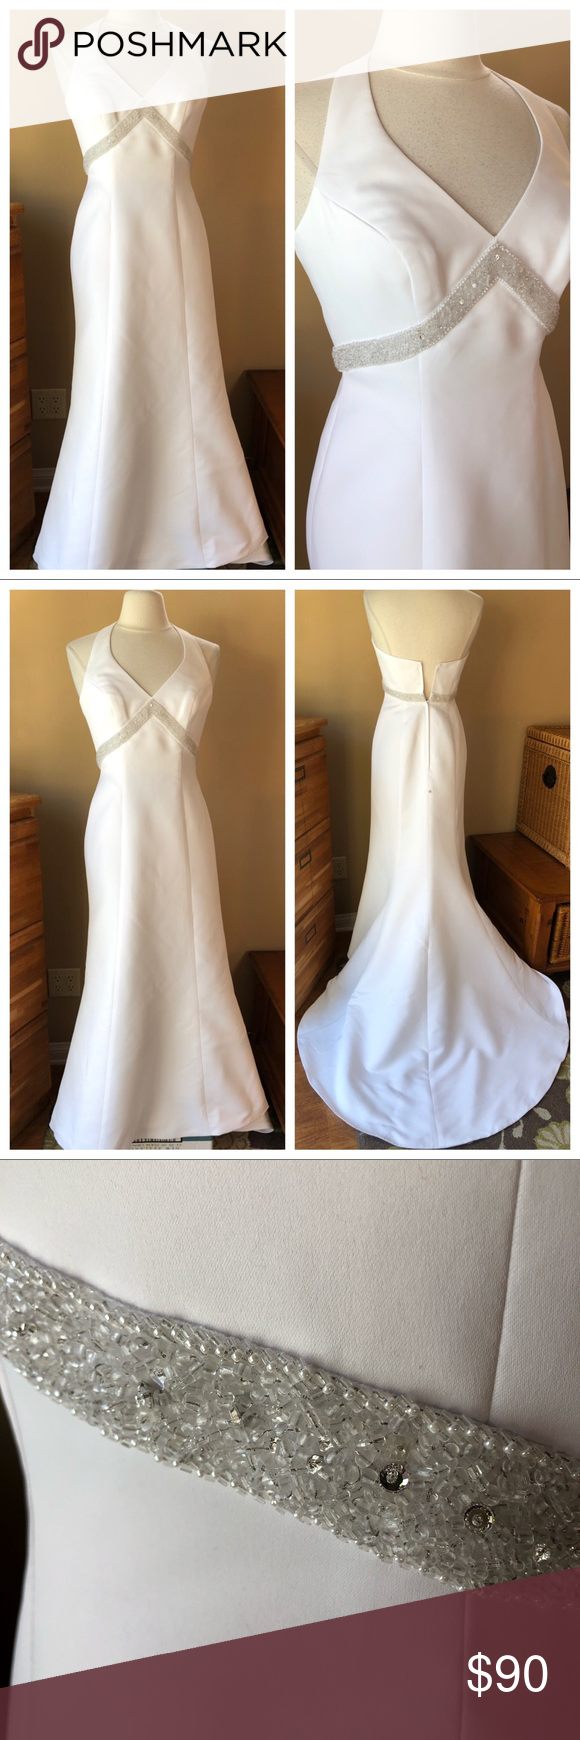 Galina Wedding Dress Sparkles T8404 Simple Elegance Wedding Dress With Sparkle Beading Trim B Sparkle Wedding Dress Elegant Wedding Dress Galina Wedding Dress